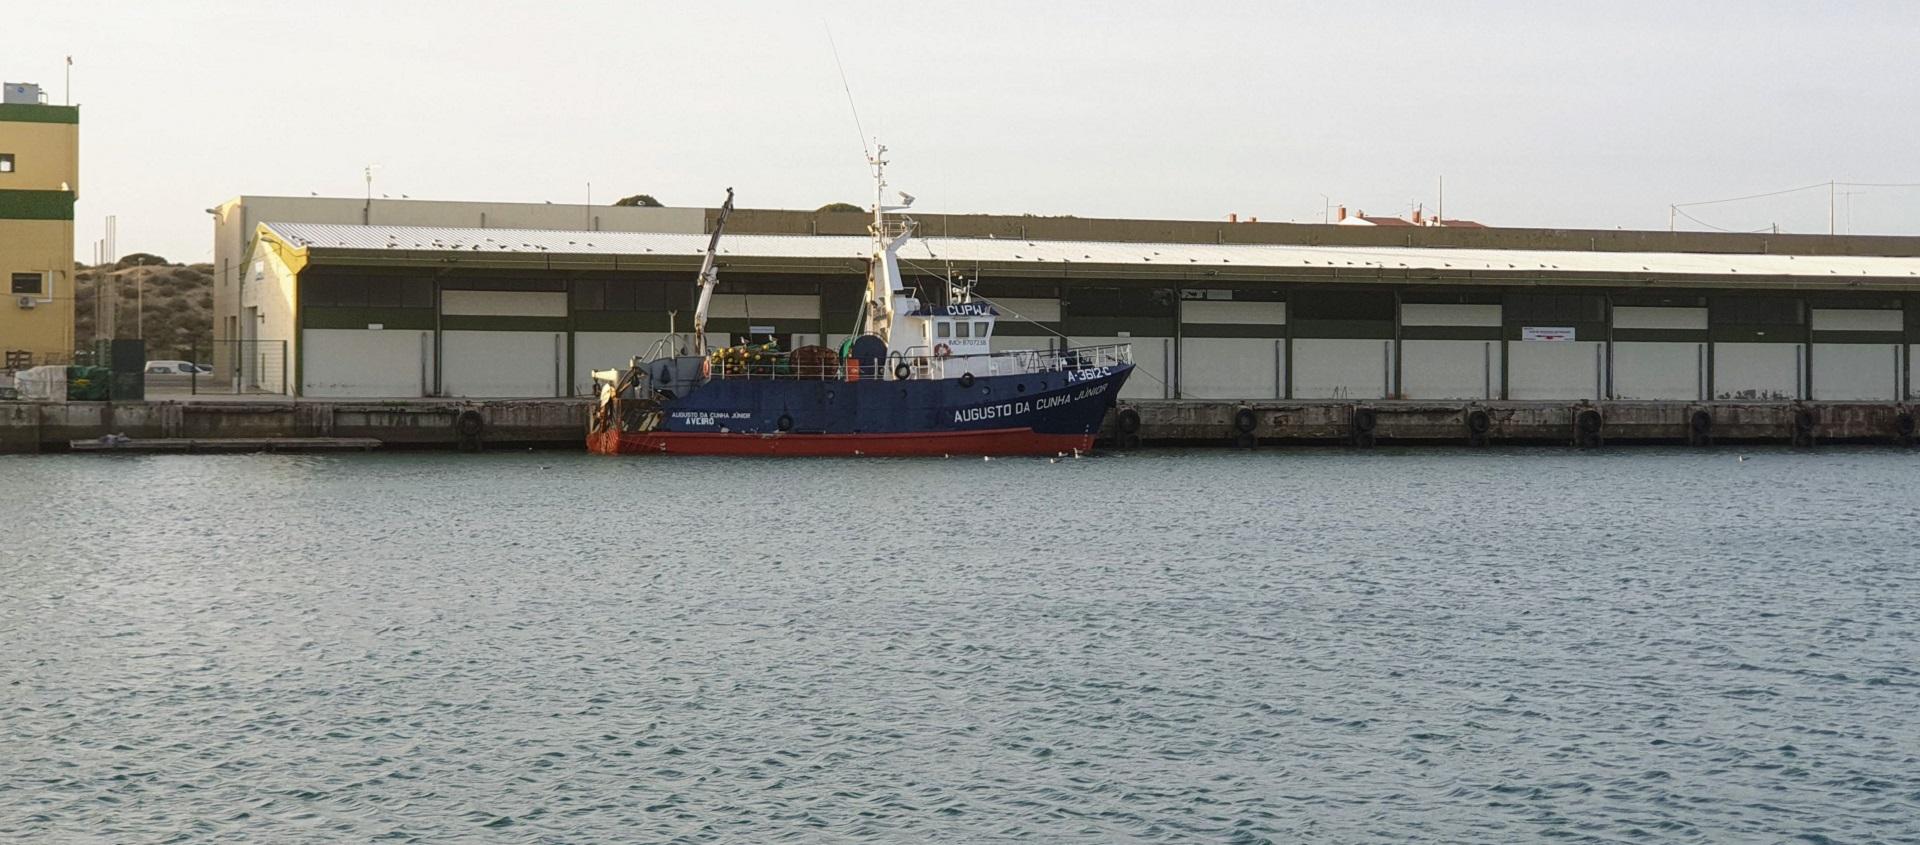 COVID-19, o apoio da Europa às pescas